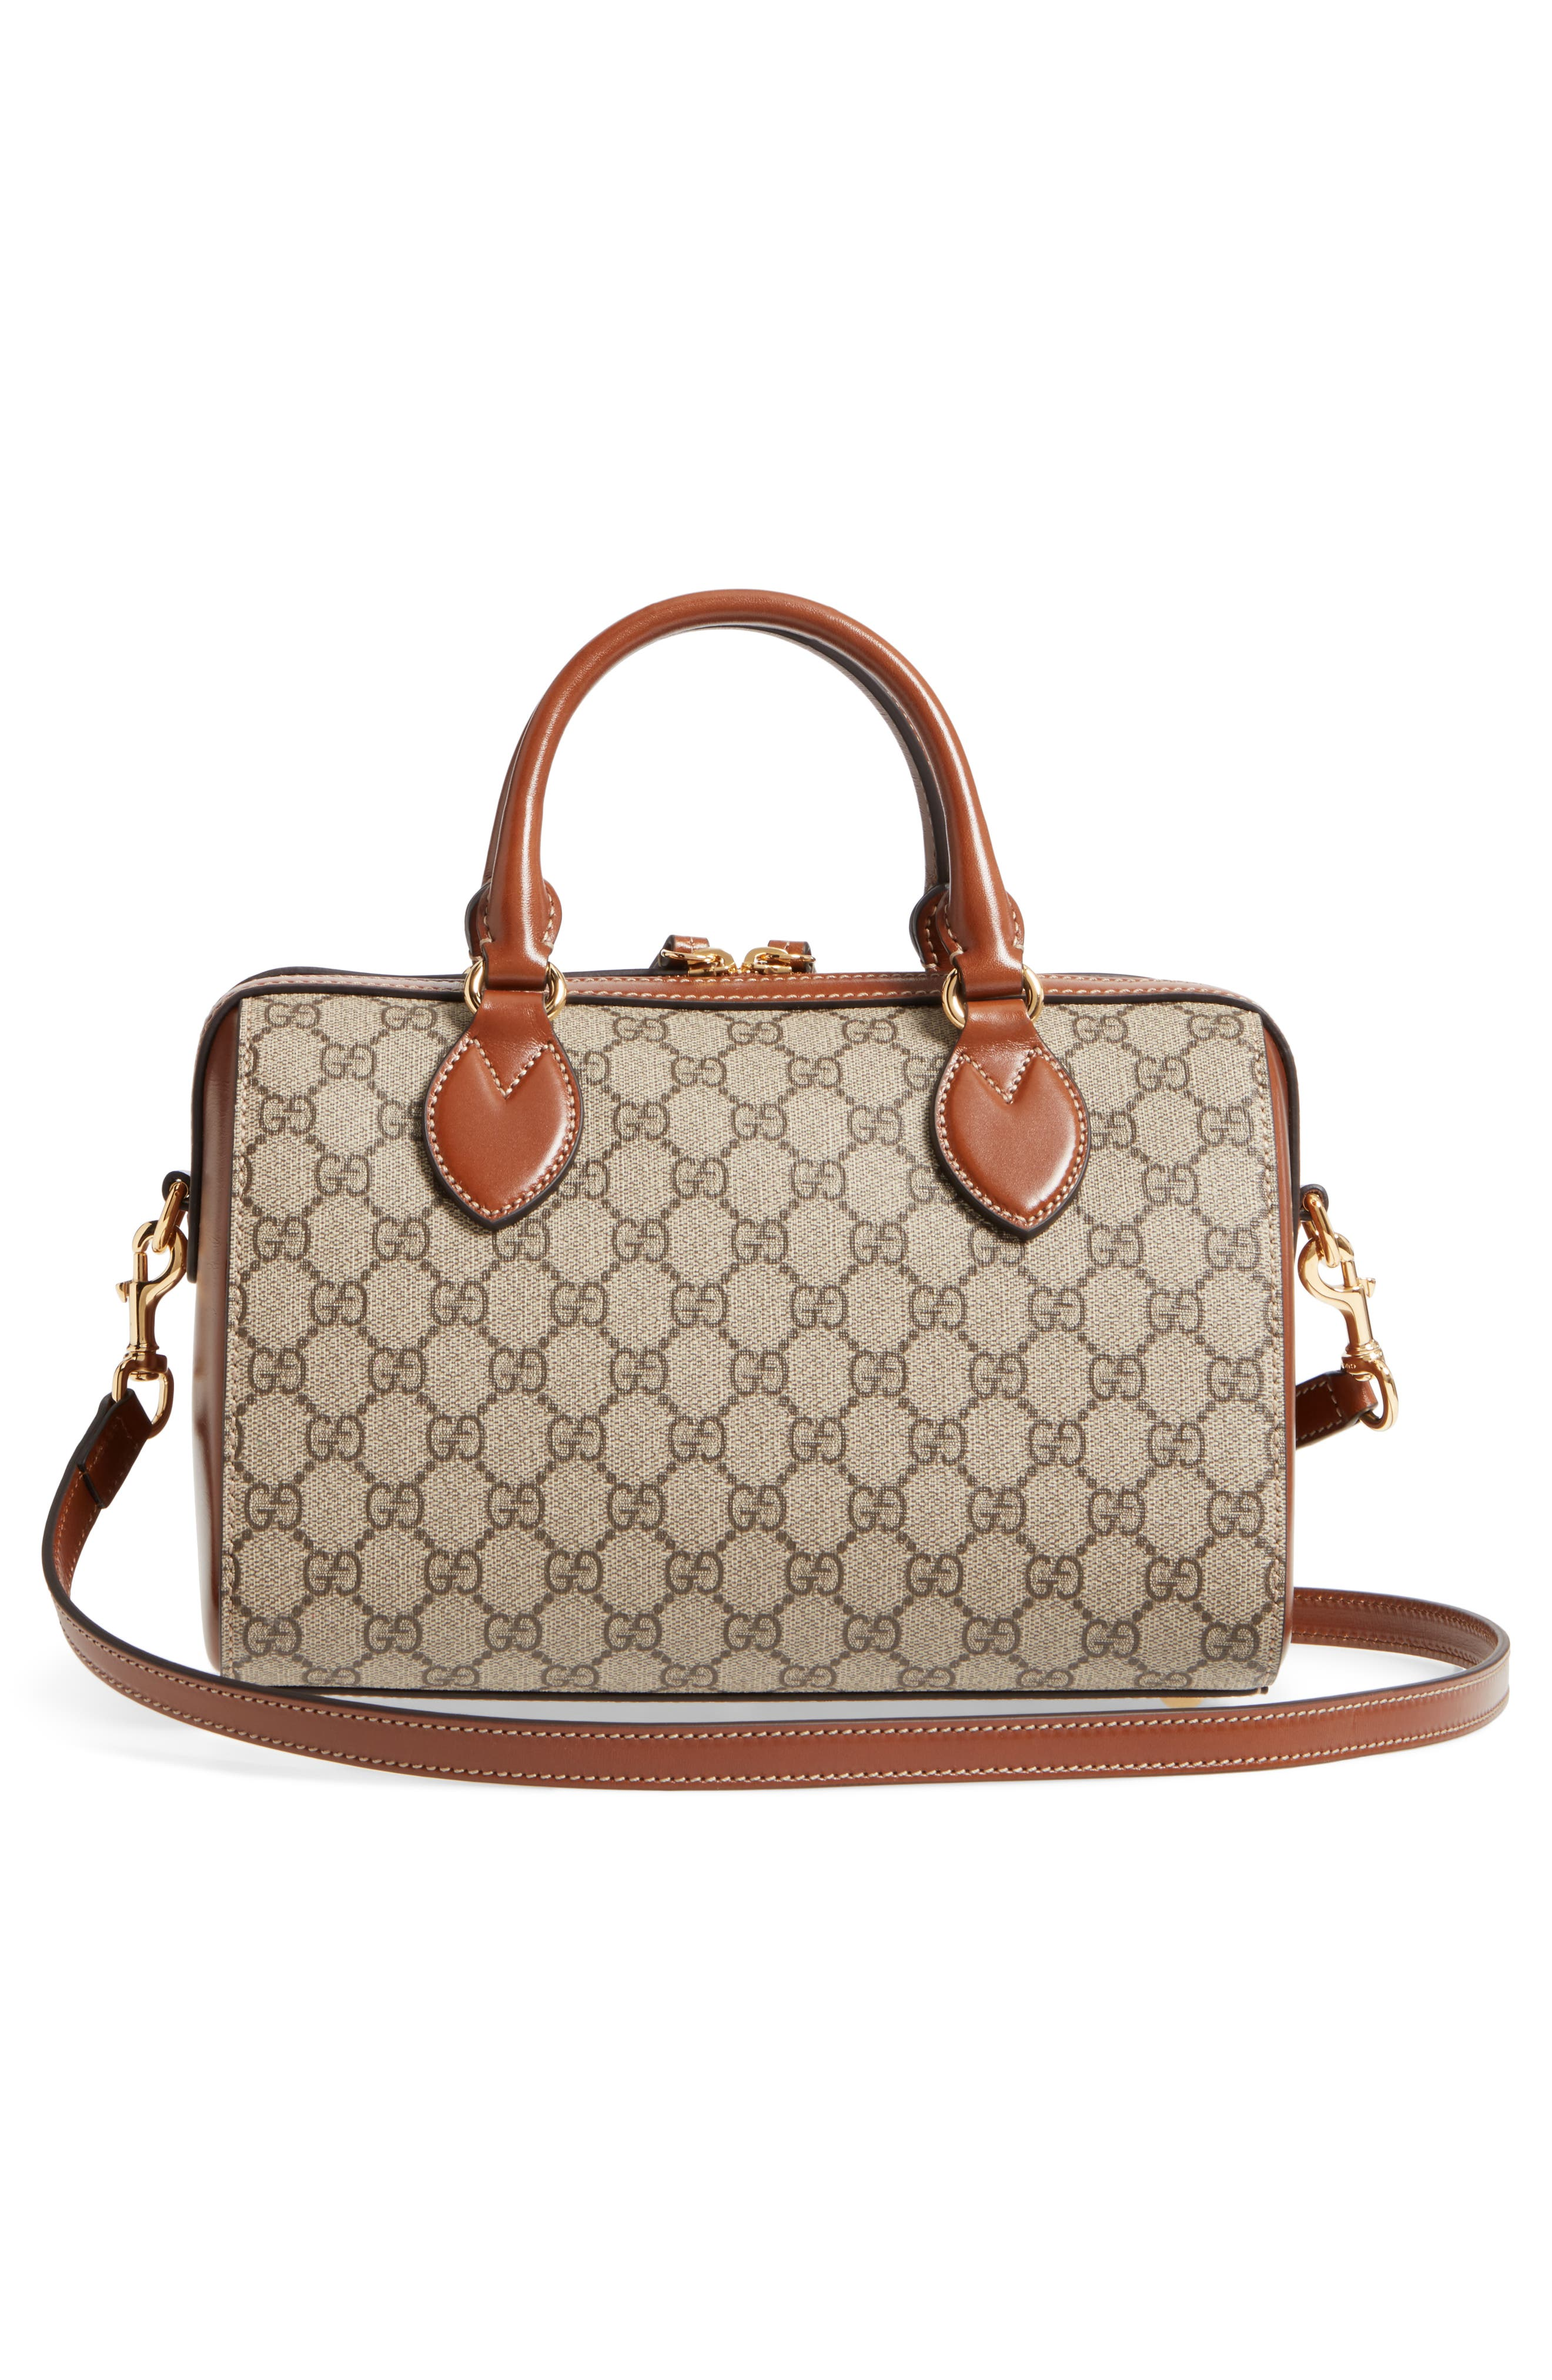 Alternate Image 3  - Gucci Linea Top Handle GG Supreme Canvas & Leather Bag